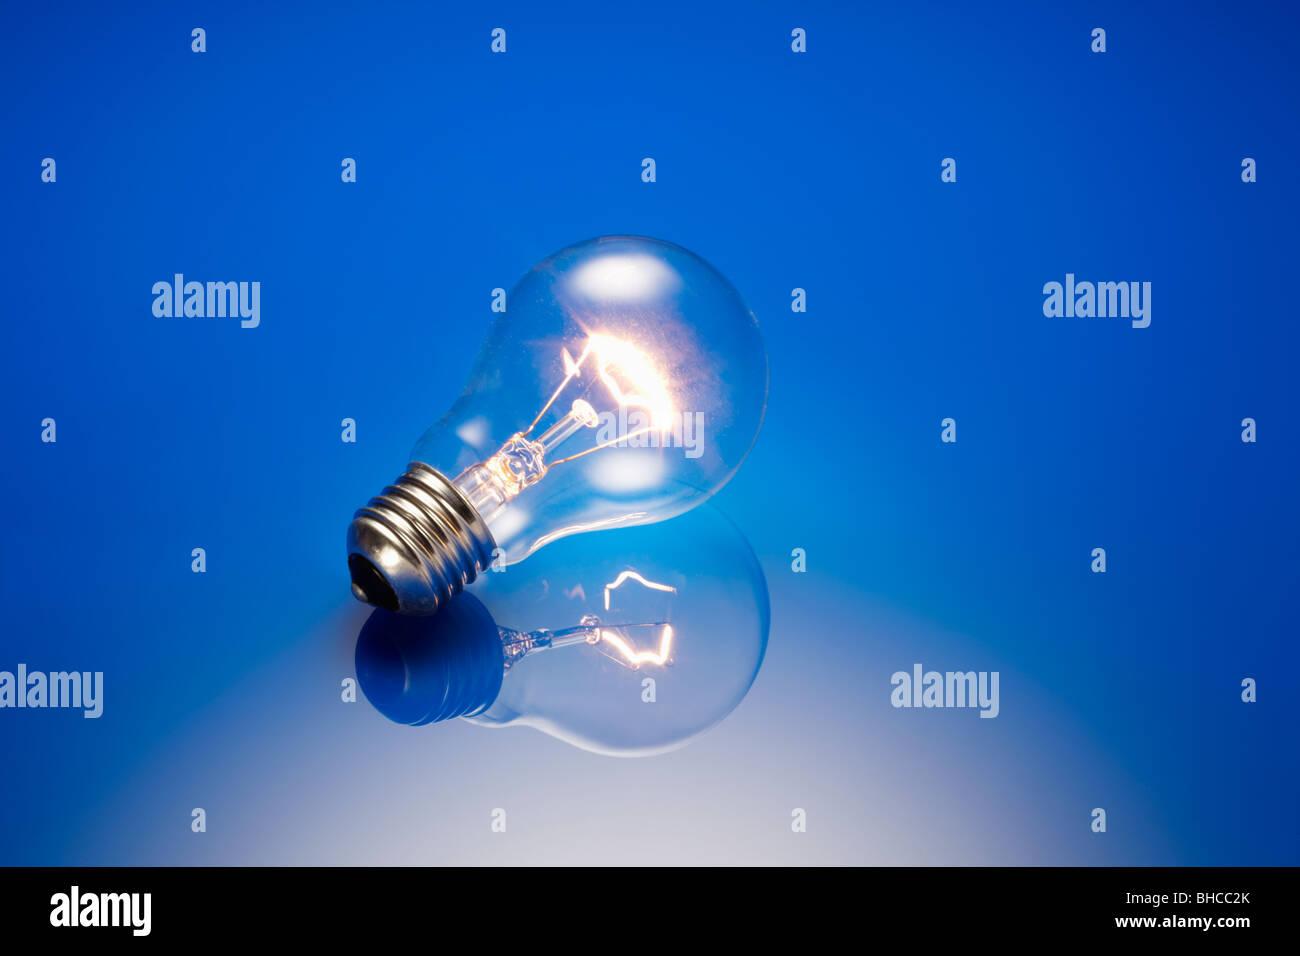 Clear Standard Light Bulb Illuminated - Stock Image